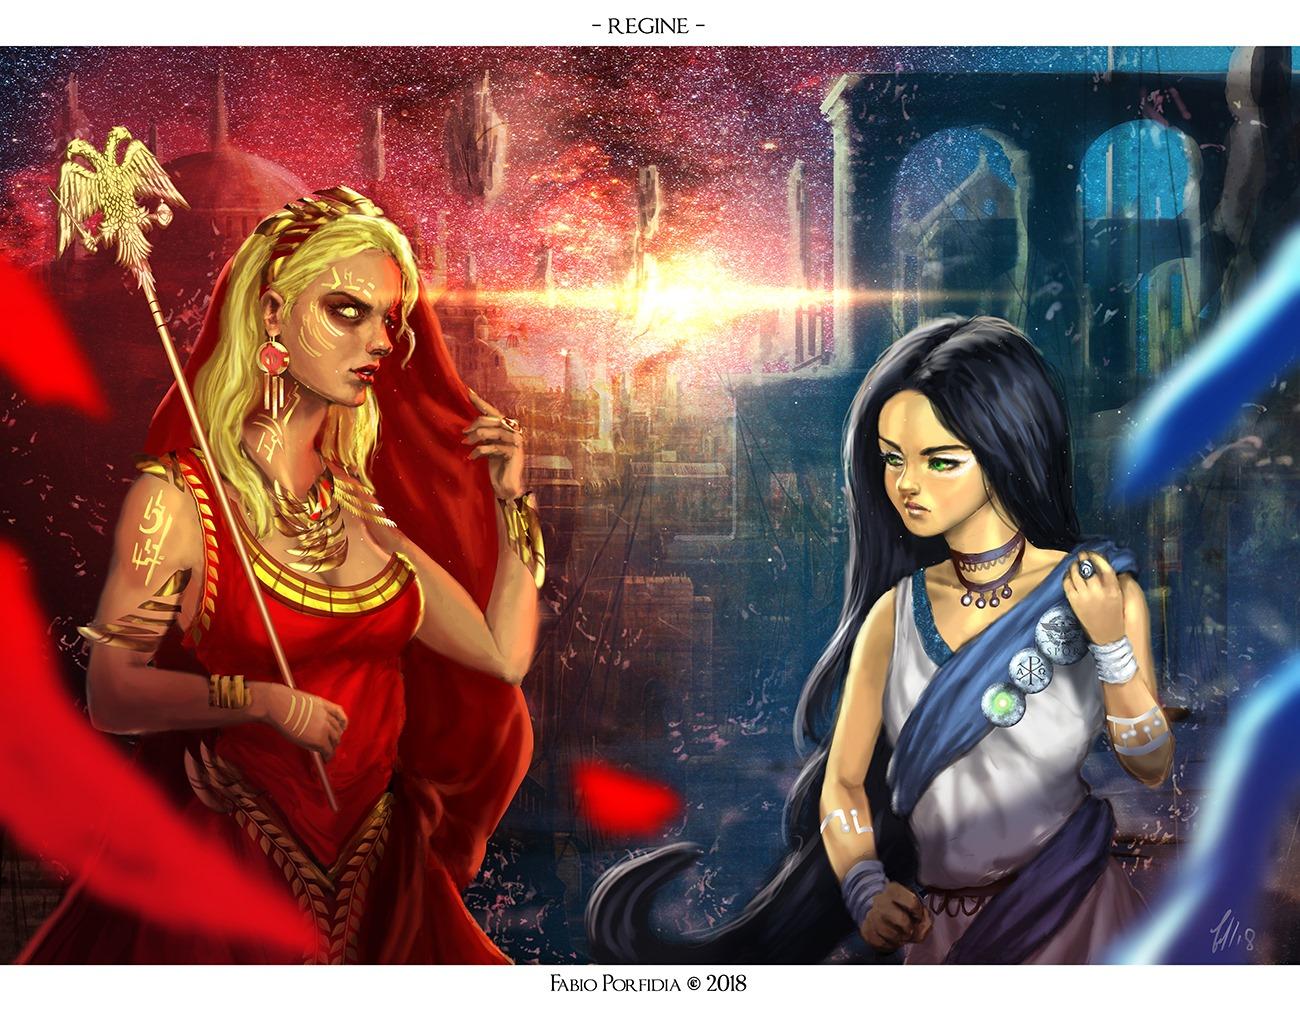 Le regine dell'espansione Taumantis